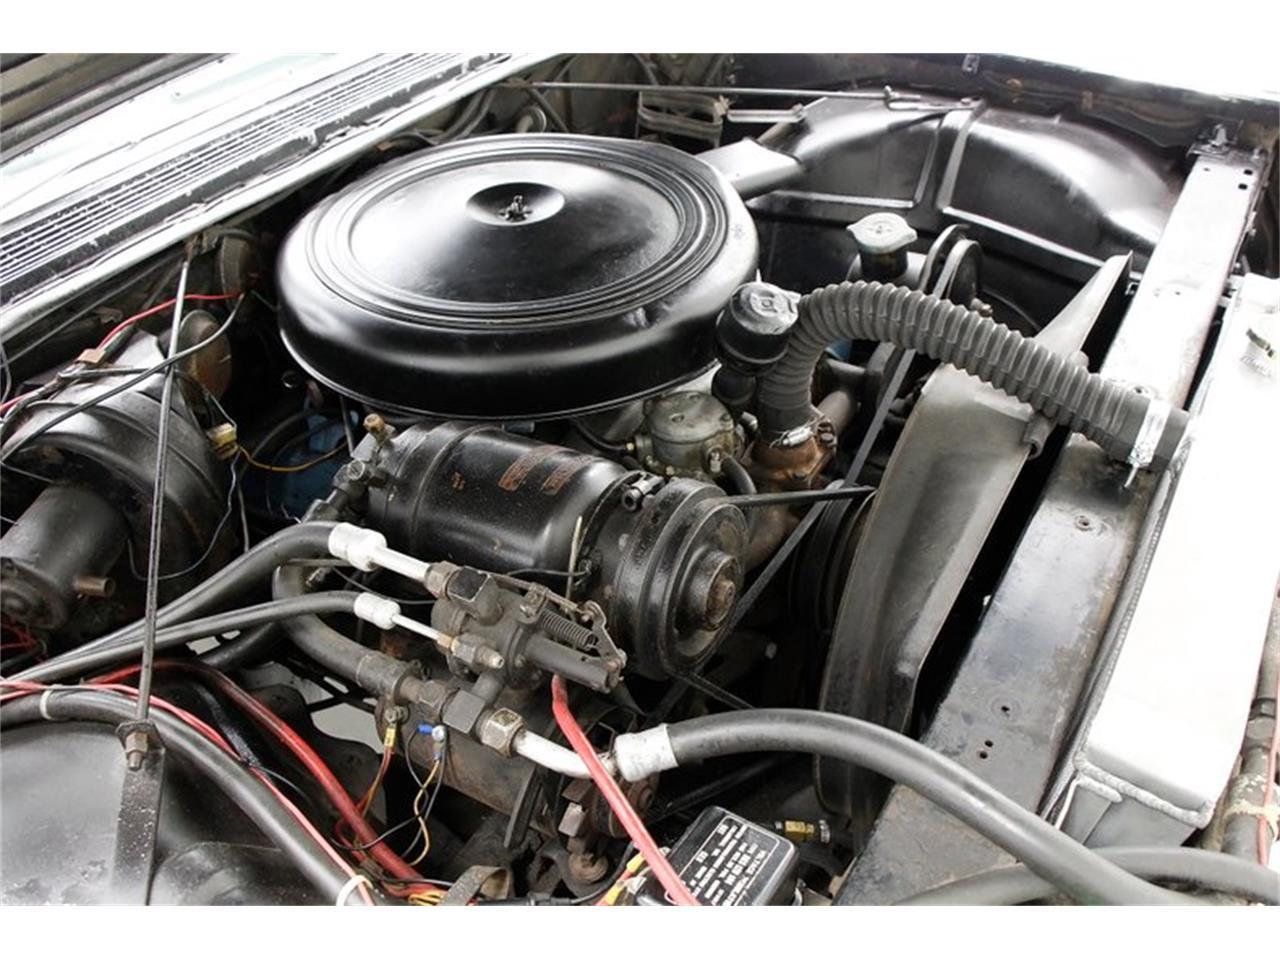 1959 Cadillac Fleetwood (CC-1245166) for sale in Morgantown, Pennsylvania